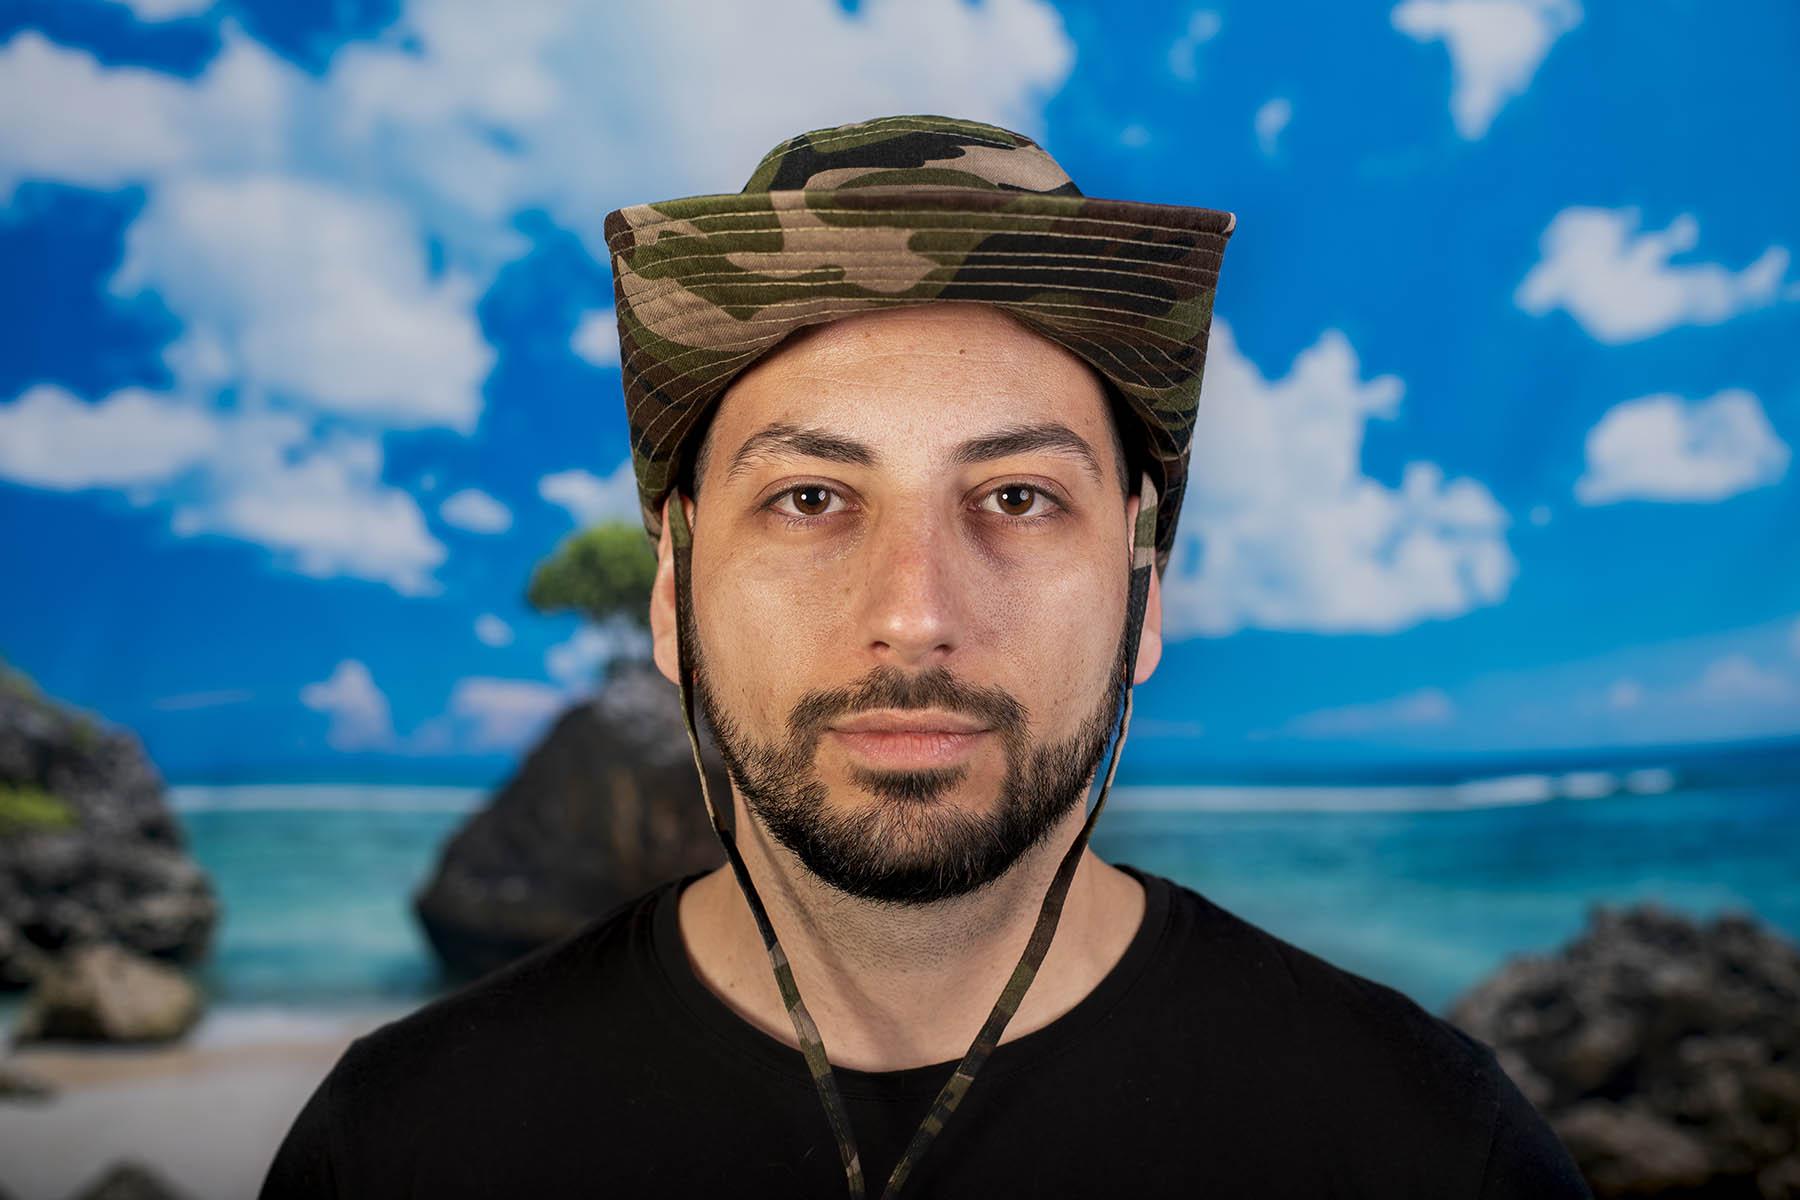 Туристическа шапка с връзки камуфлажна